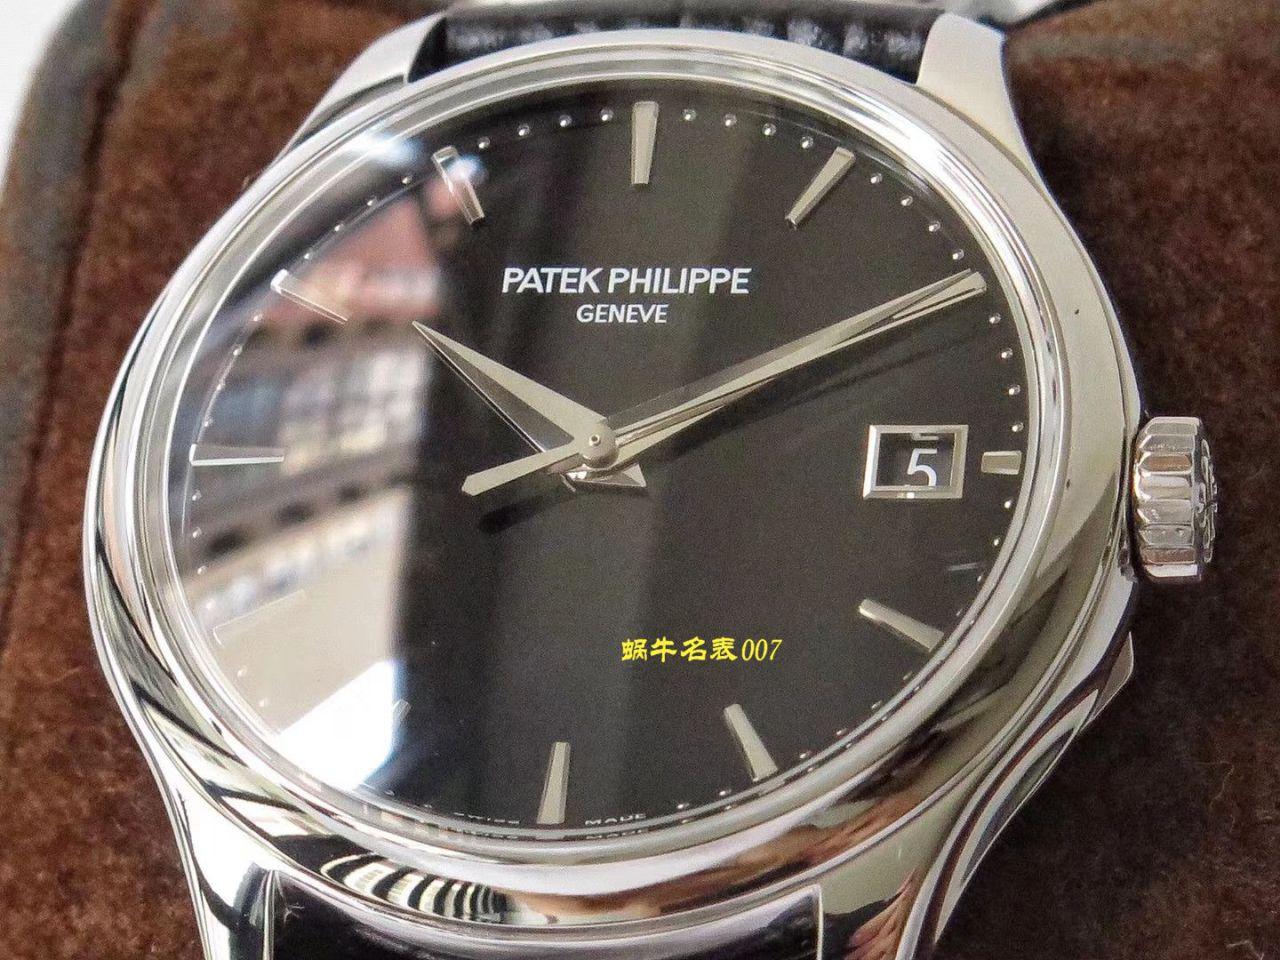 【ZF厂复刻表价格质量怎么样】百达翡丽古典表系列5227G-010腕表 / BD269